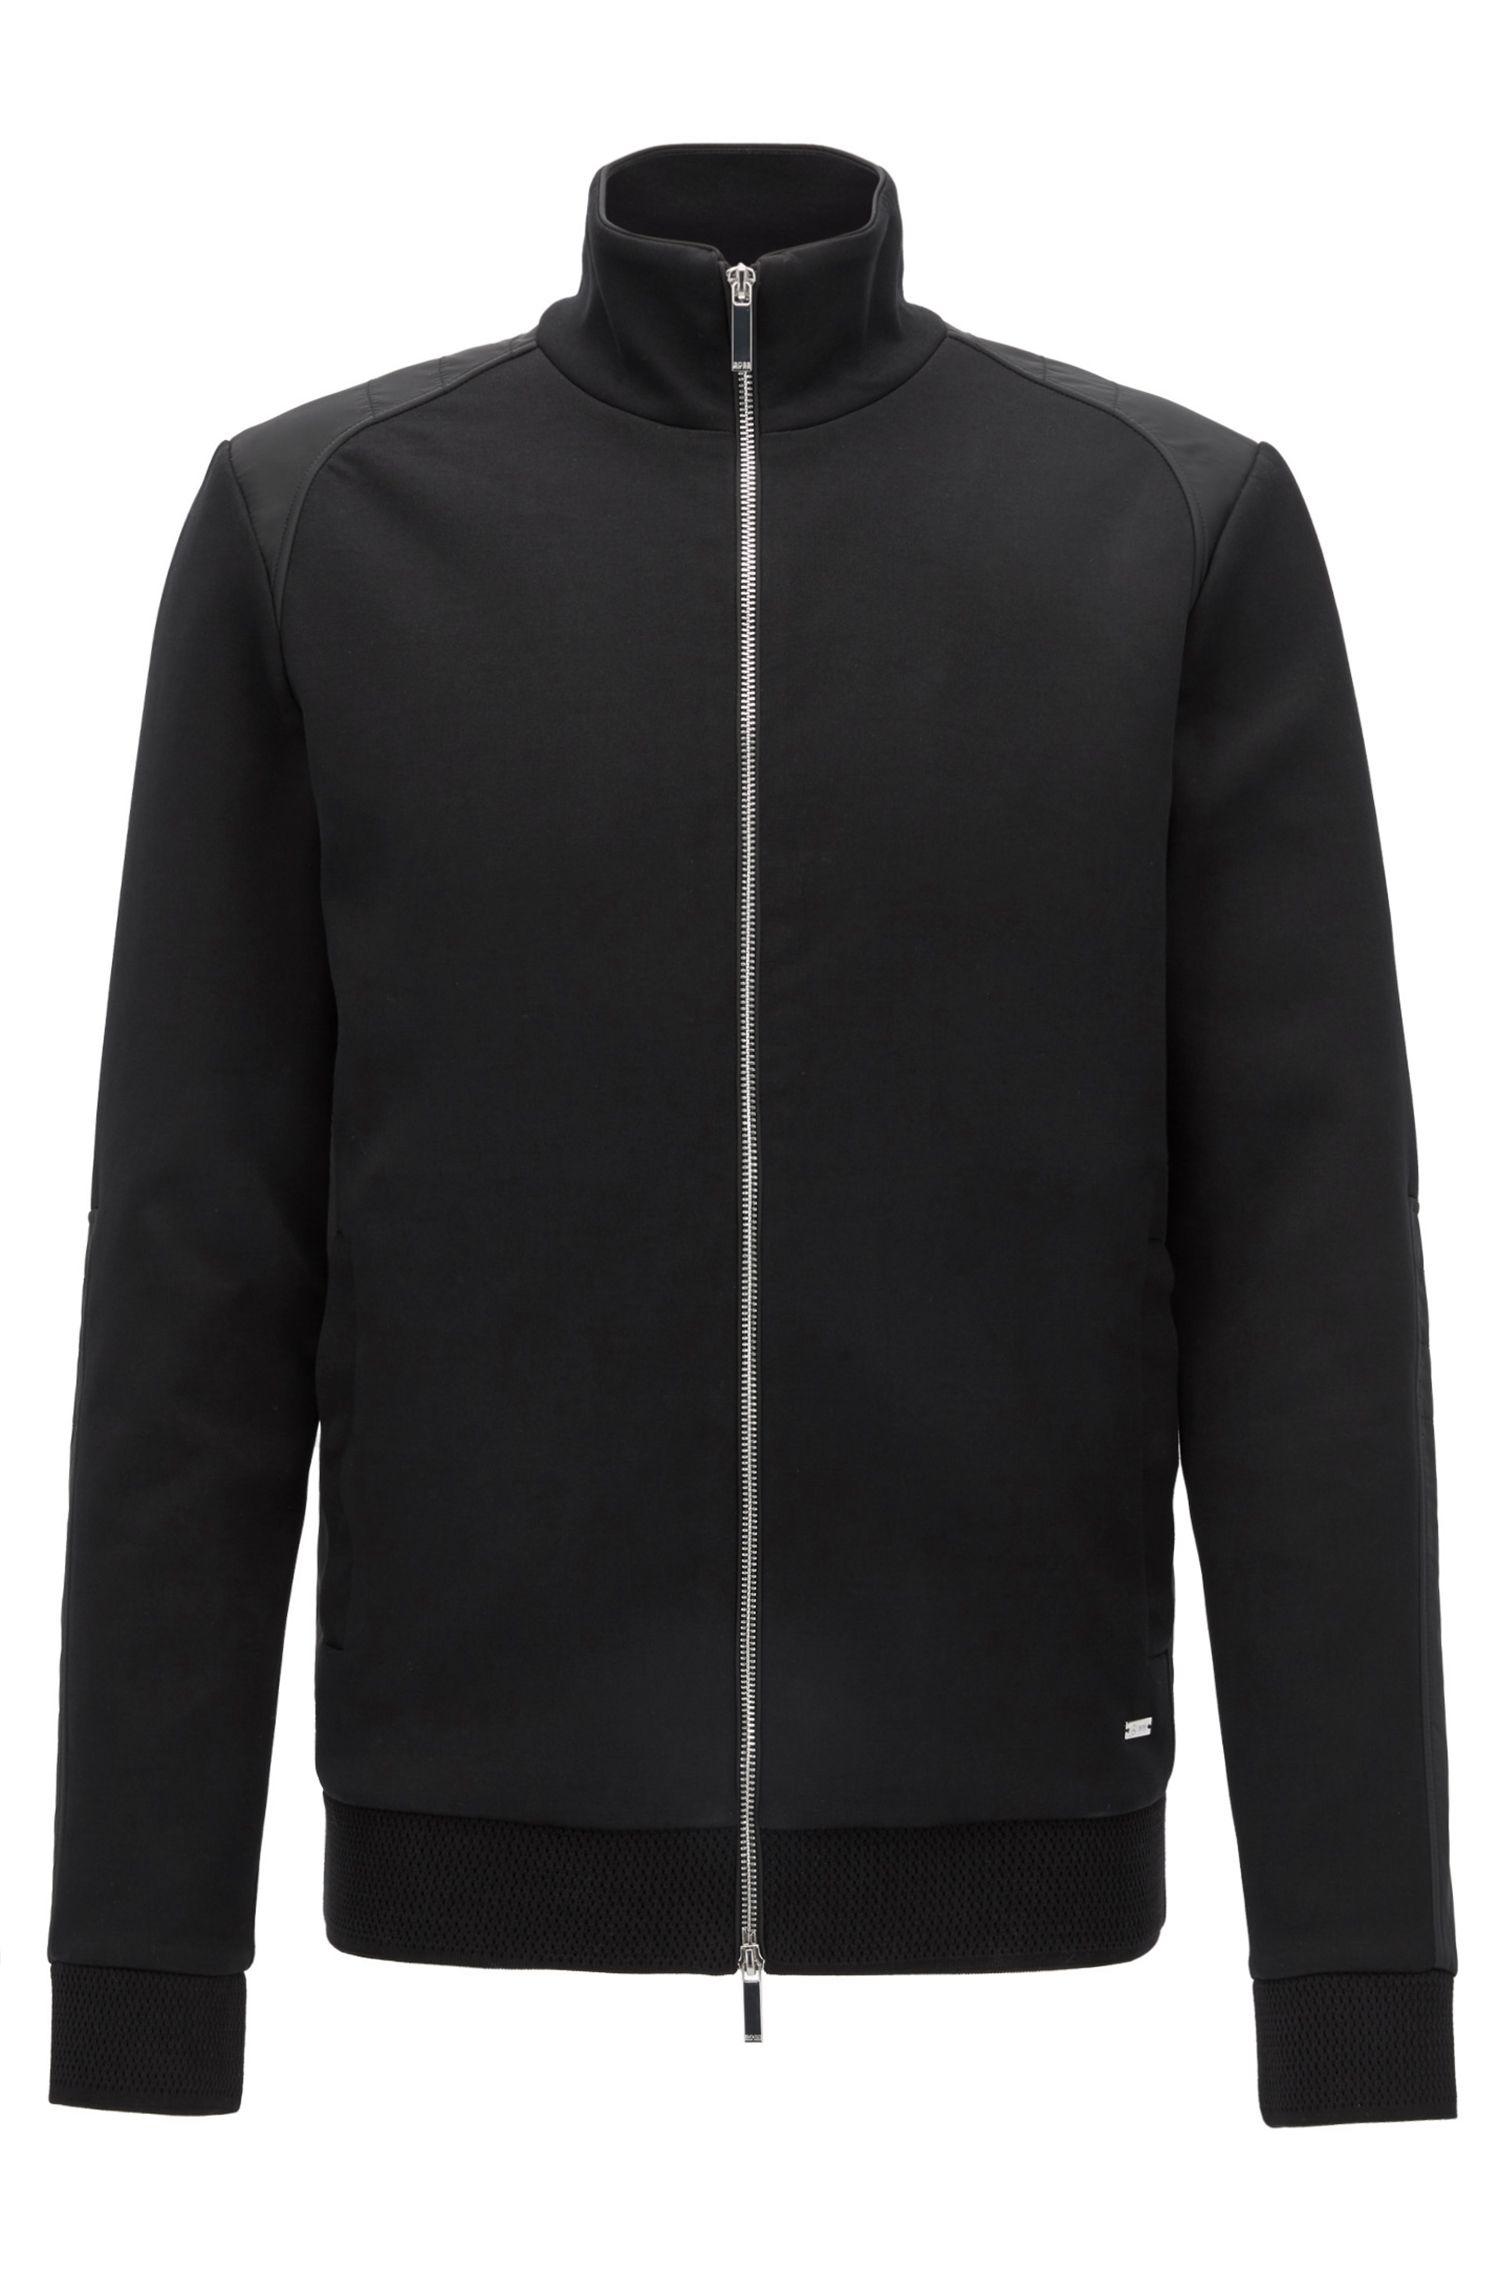 Cotton Blend Full-Zip Jacket | Soule